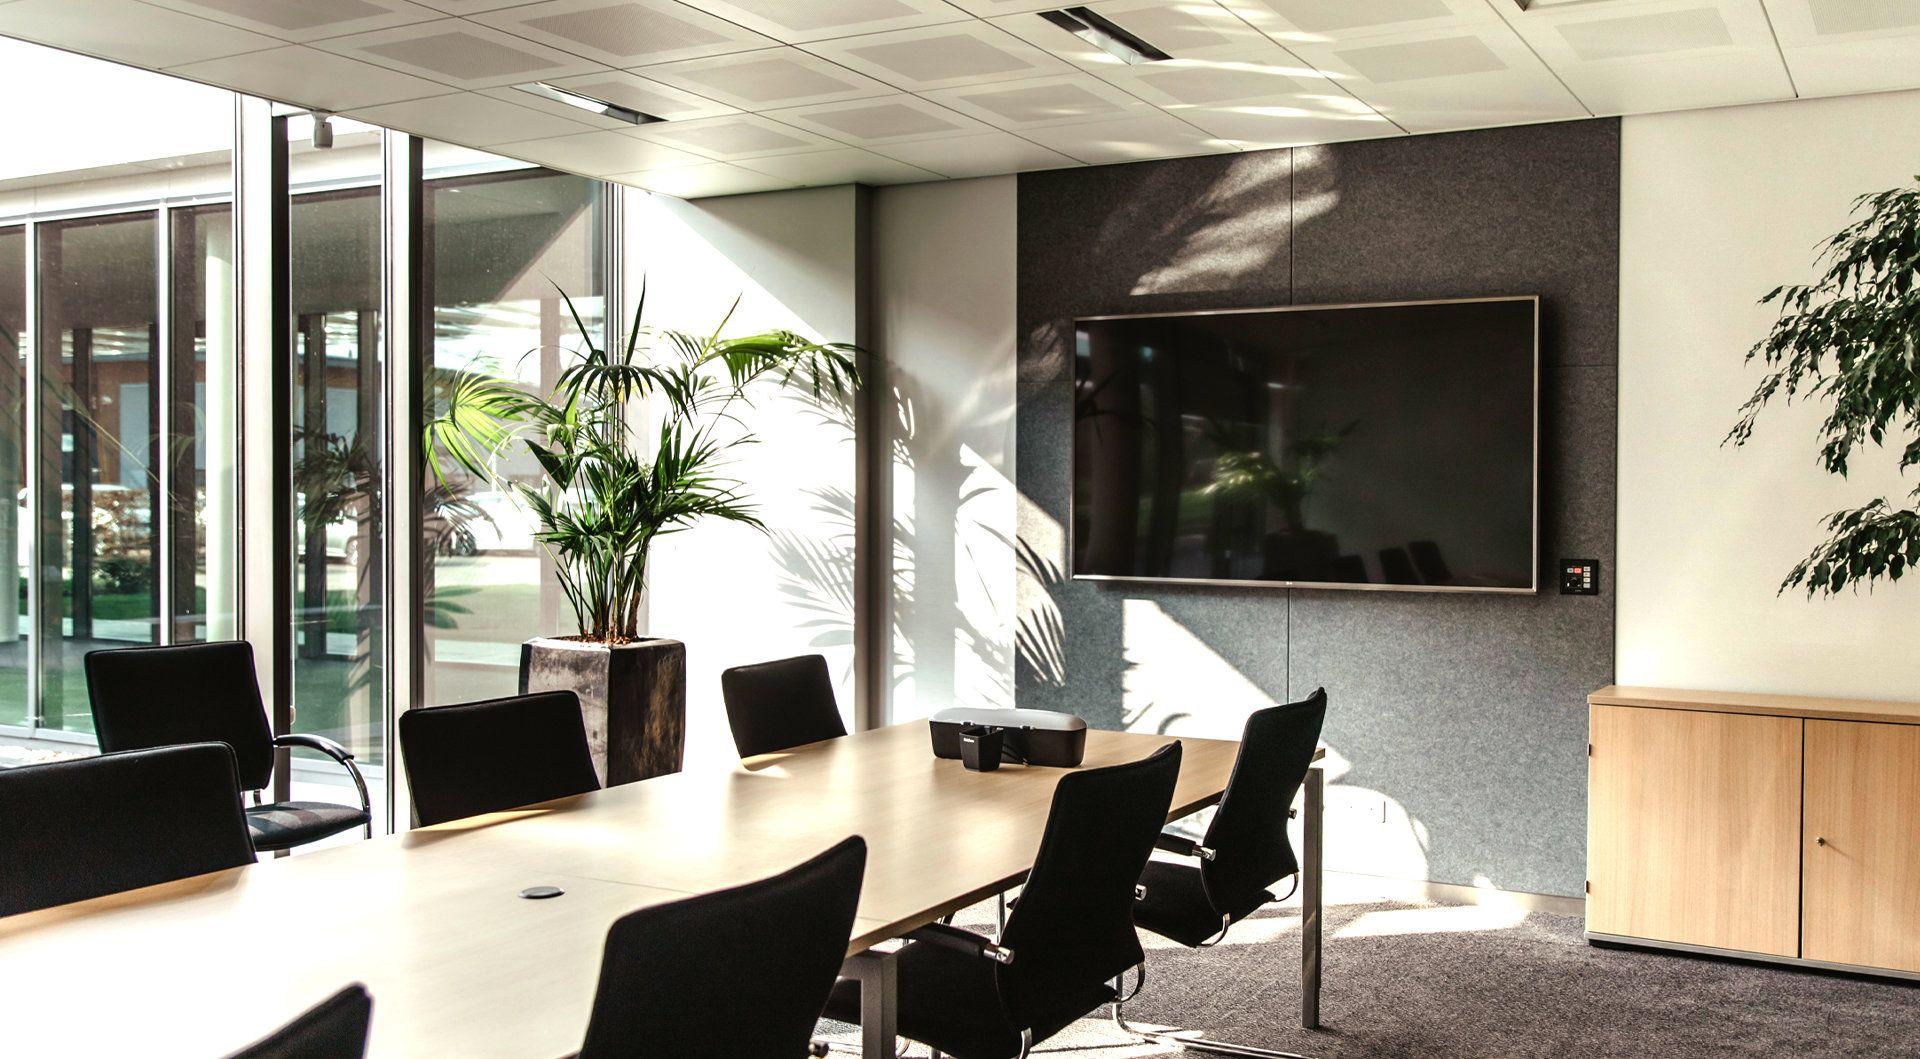 "iiyama MD BRPCV02 flat panel muur steun 68,6 cm (27"") Zwart - Case studie de vries"